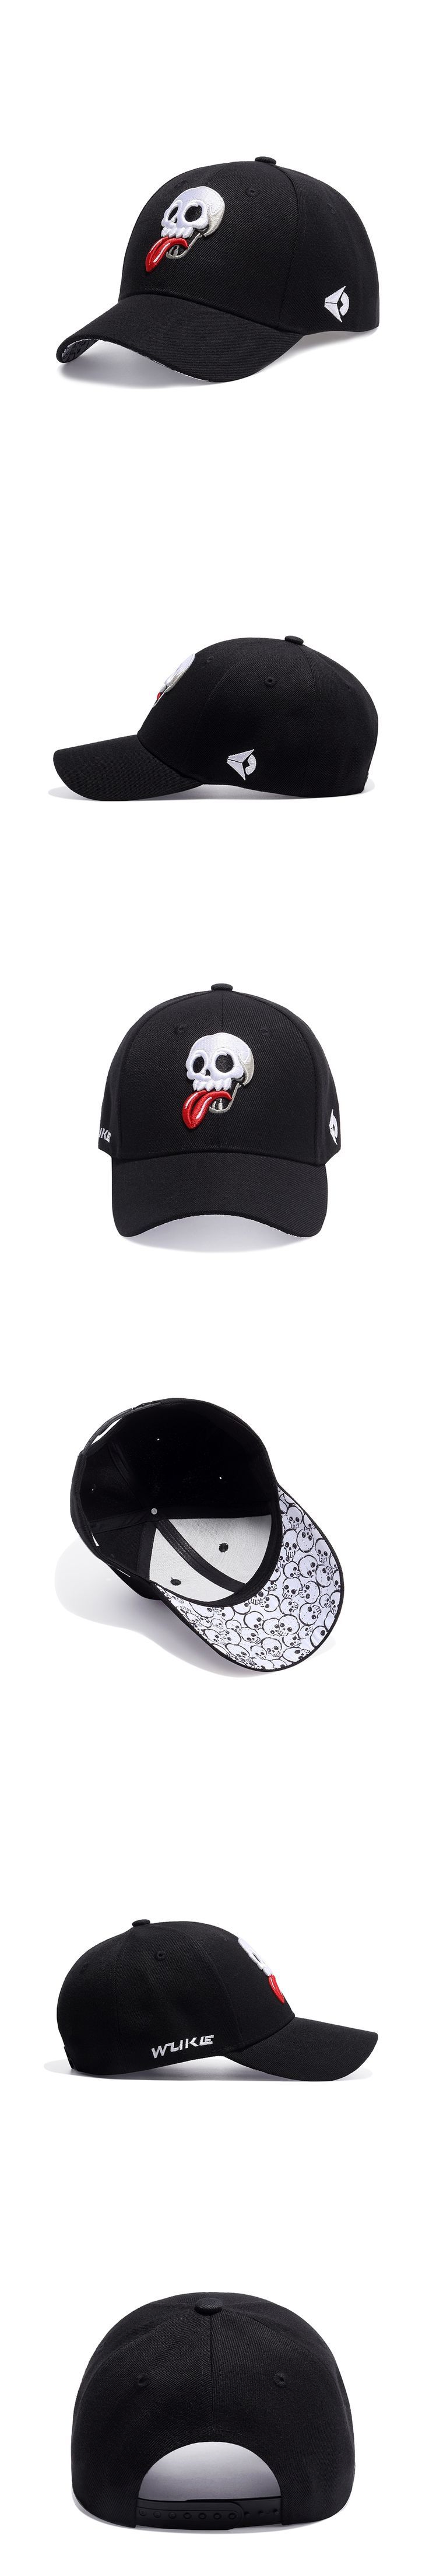 Swag Design Baseball Cap Funny Skull Embroidery Cap Men Hip hop Caps Embroidered Logo Summer Sun Hat Trucker Hats For Women